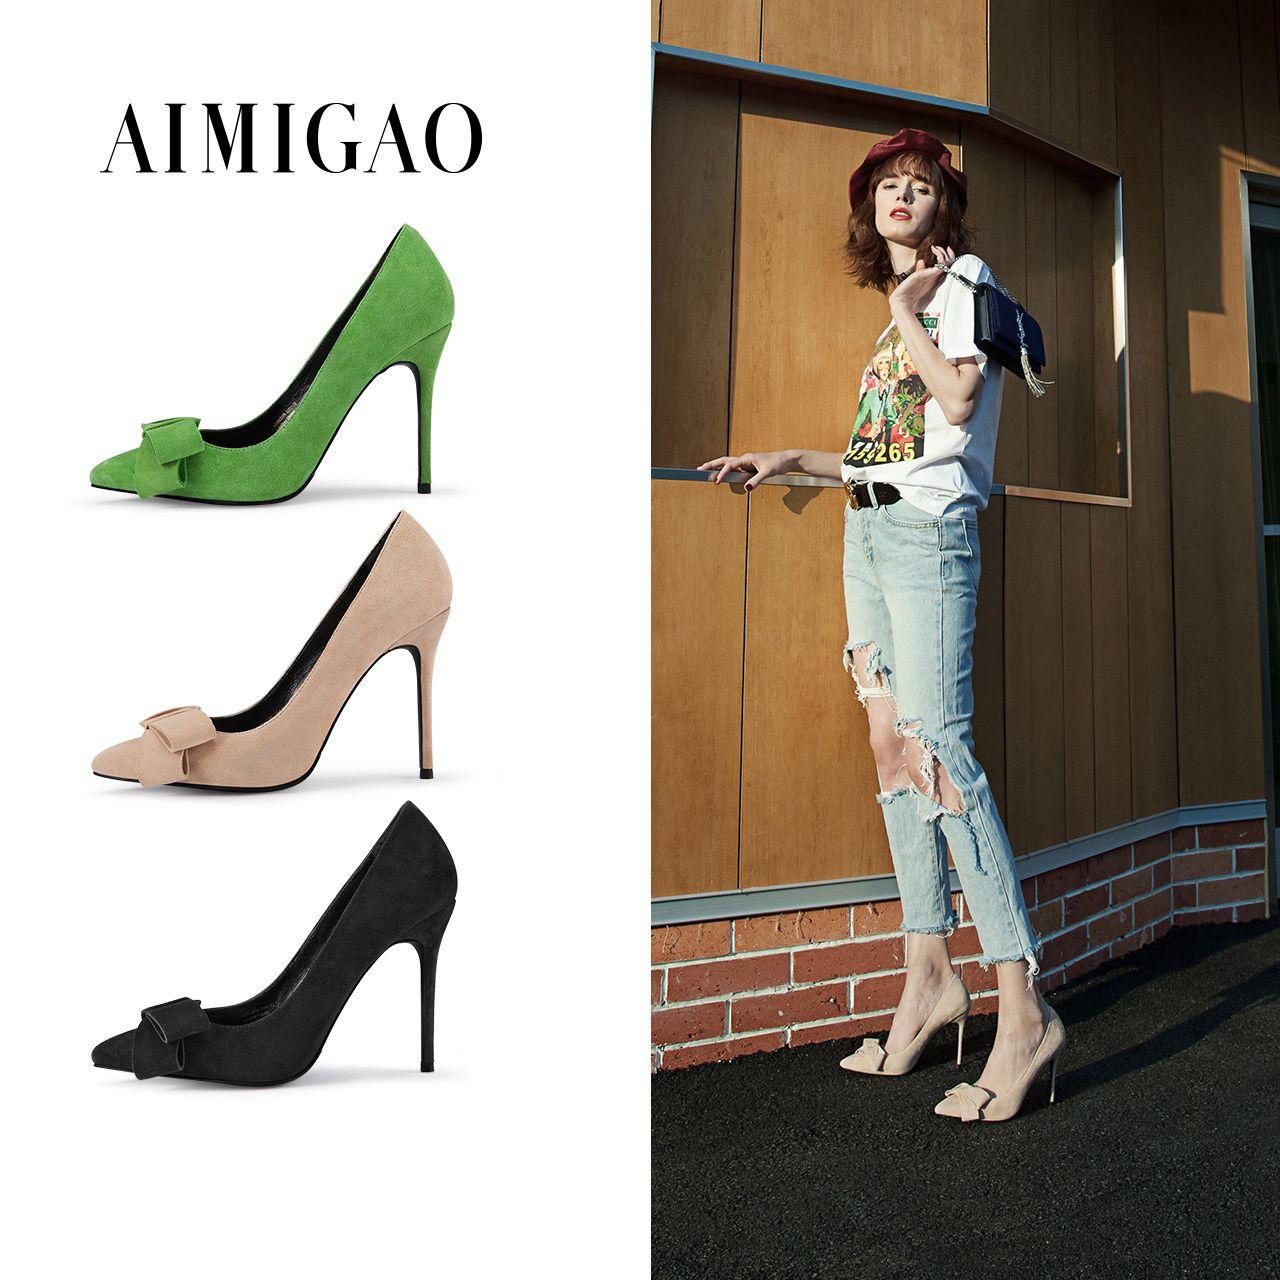 AIMIGAO Echtem Wildleder Spitz Stiletto High Heel Schuhe Mode Einfarbig Schöne Bowknot Pumps Schuhe 2018 Frühling